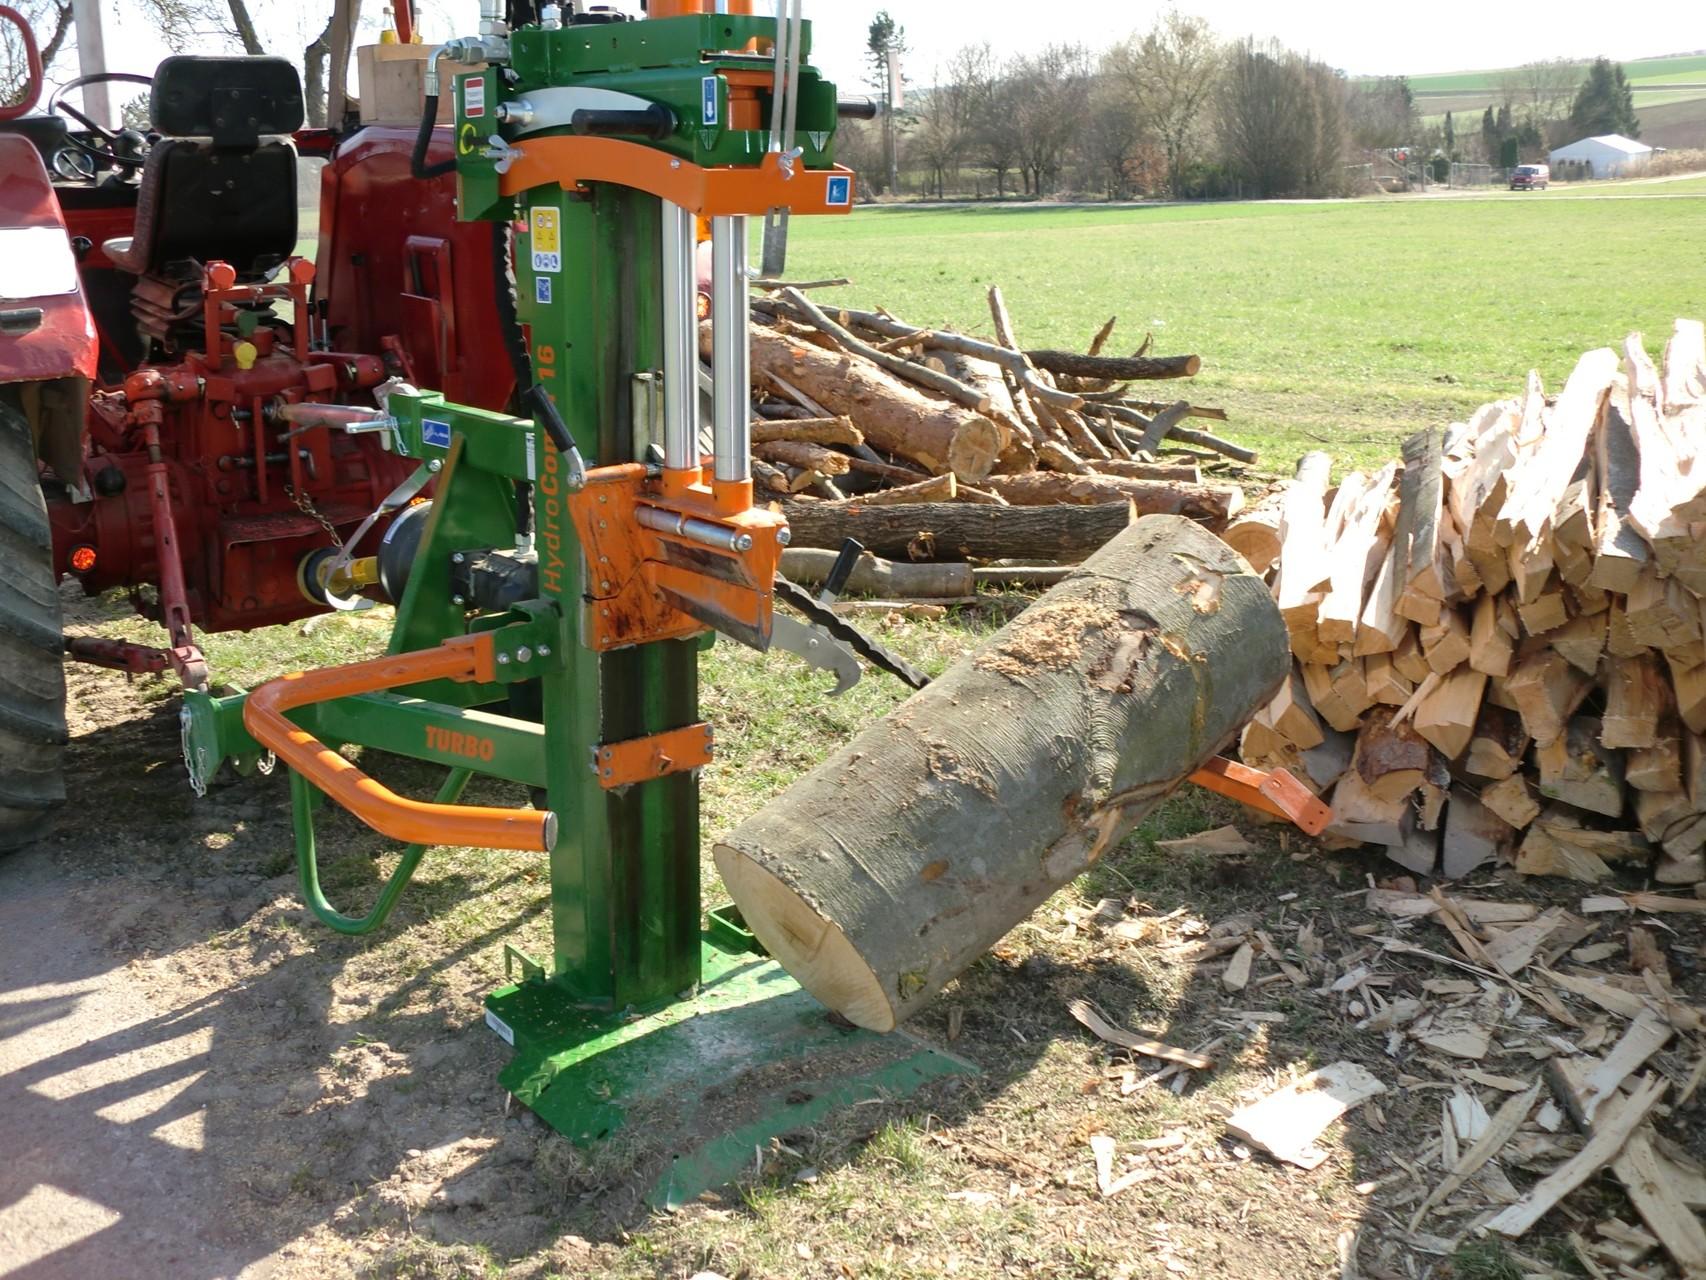 Lieblings Holz spalten + bündeln - MH Brennholz Rottenburg @JQ_53